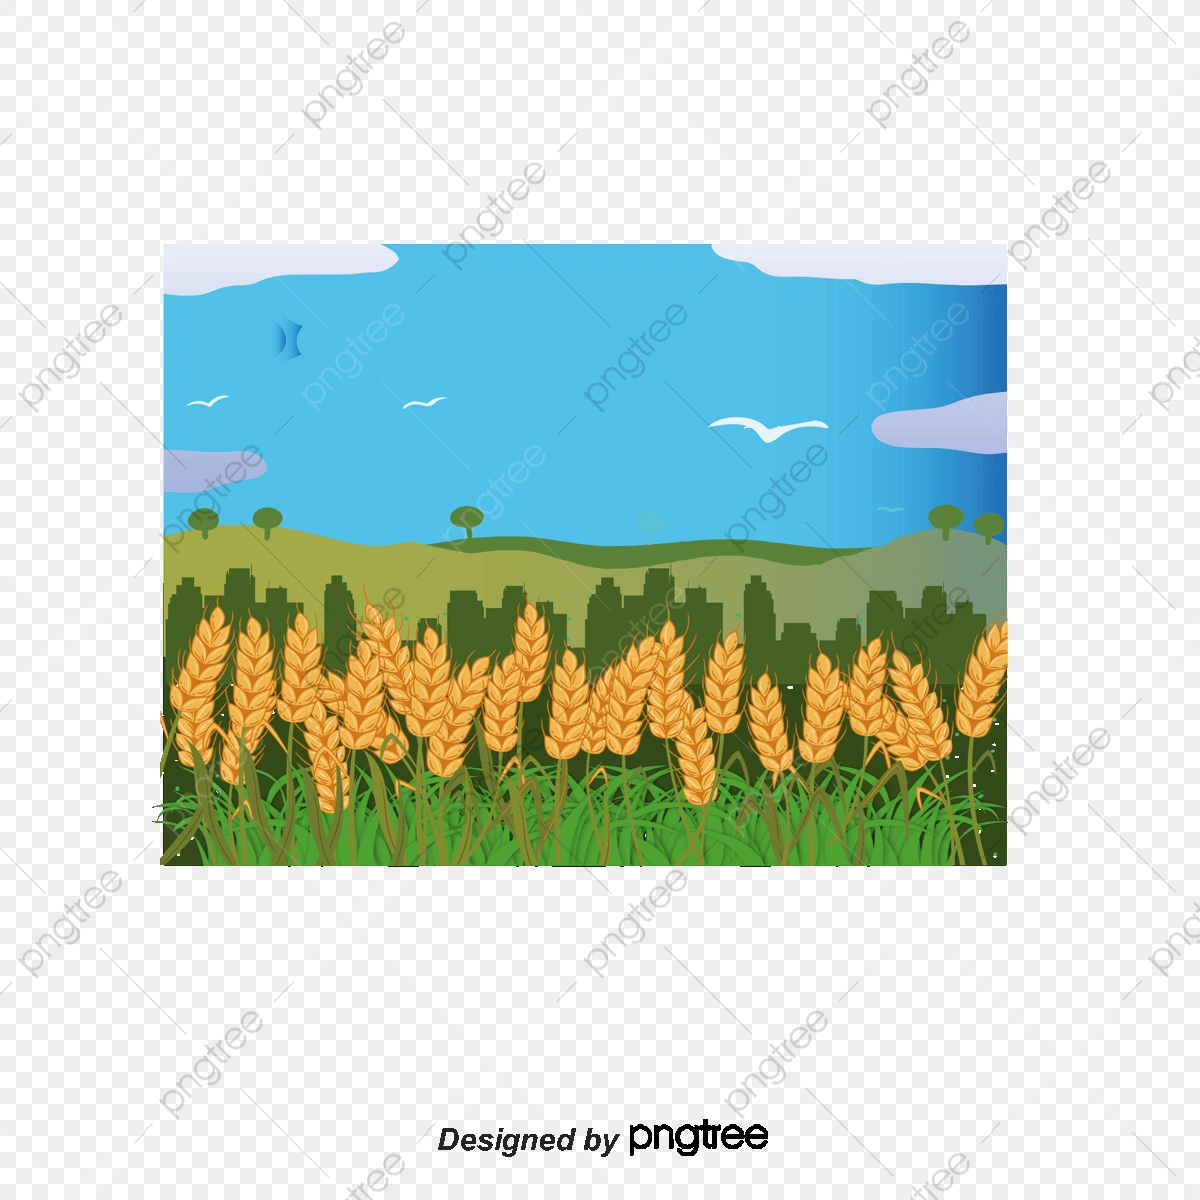 Kartun Ladang Sawah Itu Scarecrow, Scarecrow, Beras, Beras PNG dan.